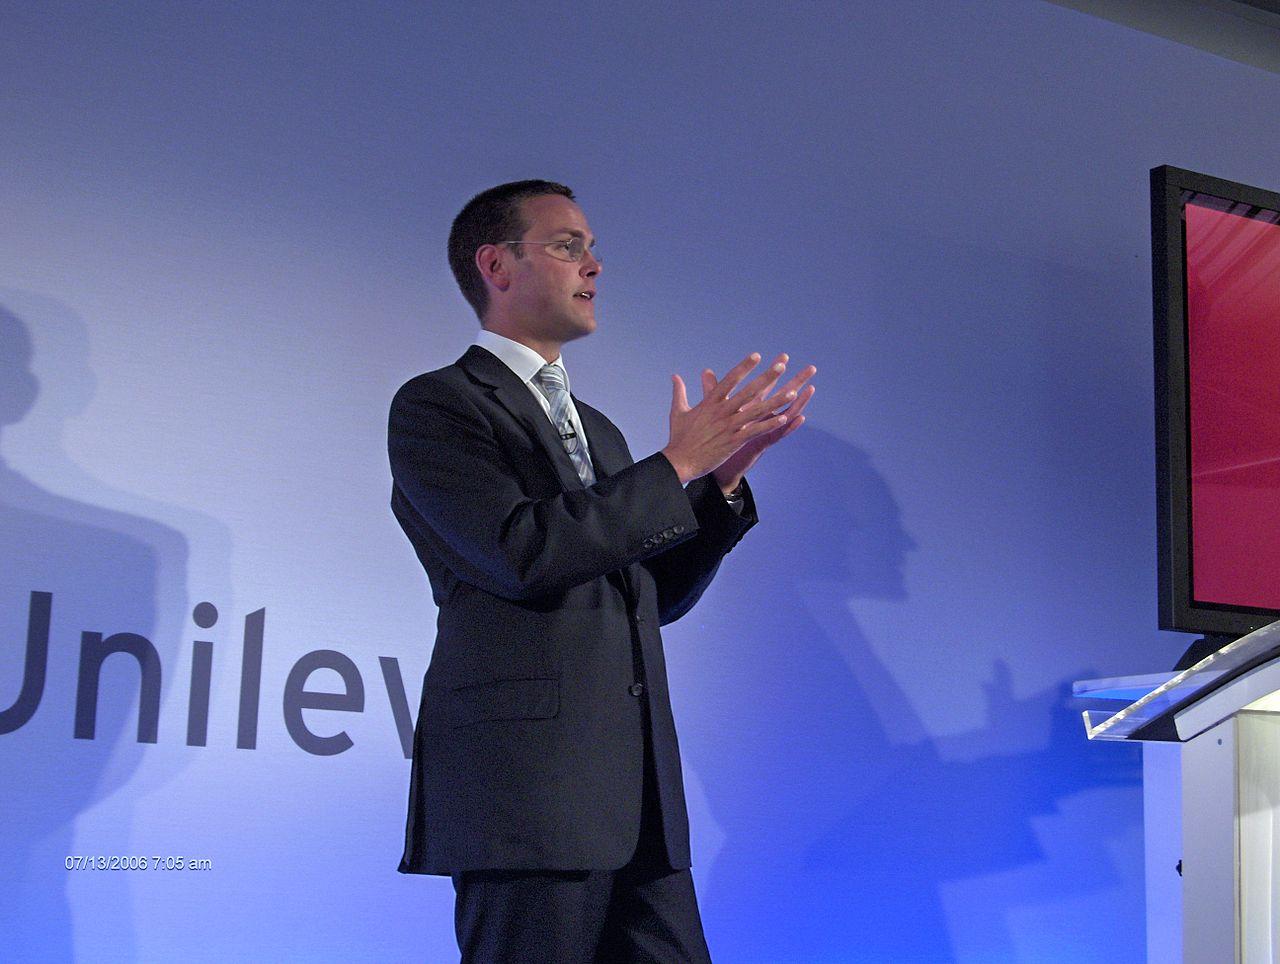 James Murdoch, son of media tycoon Rupert Murdoch, is the current Sky CEO. Image: Wikimedia